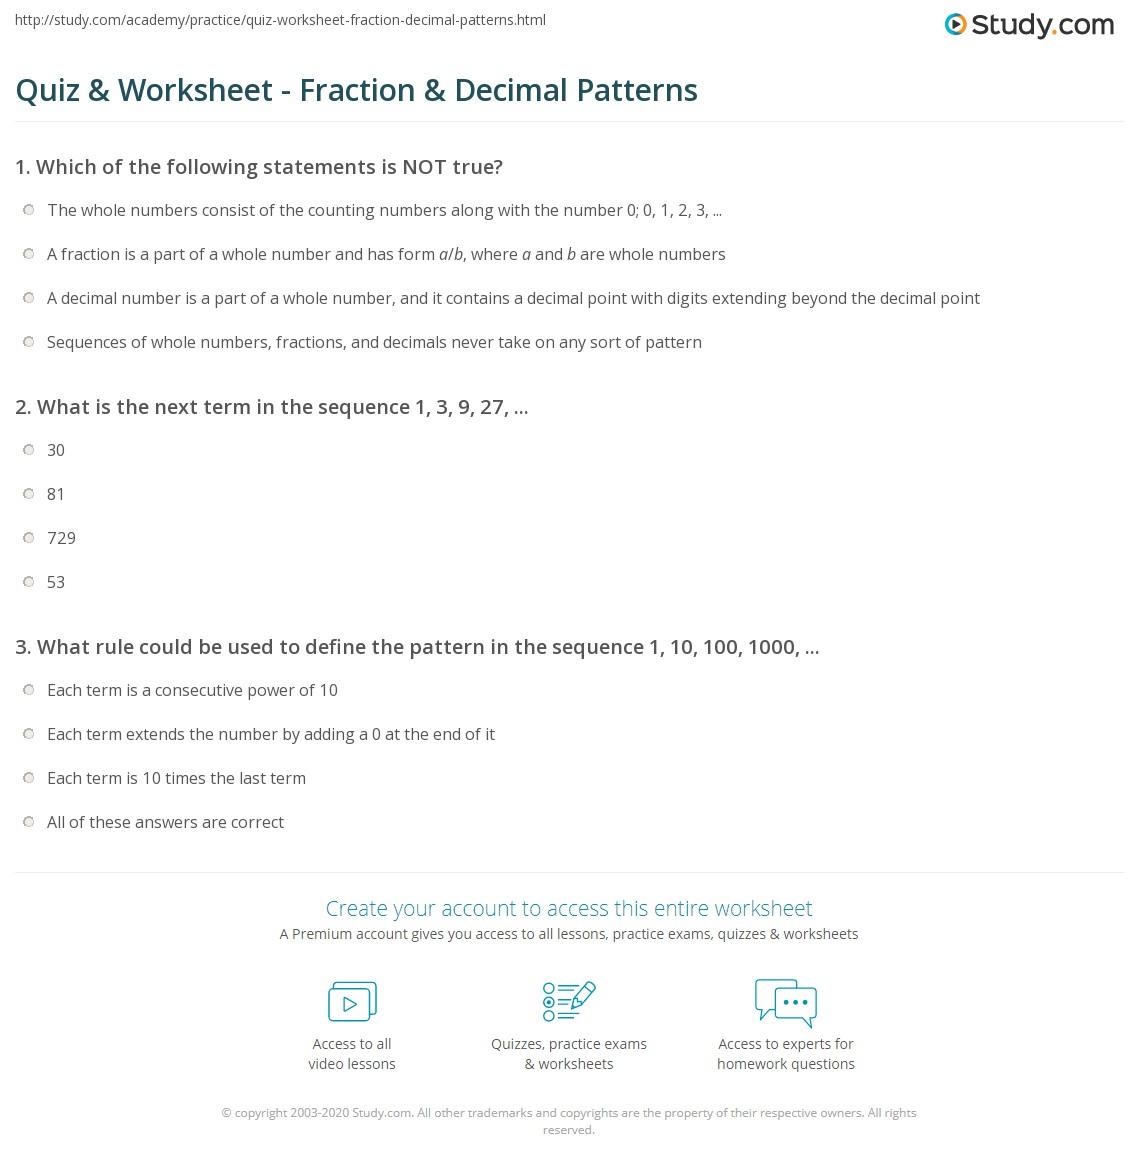 Workbooks sequencing numbers worksheets : Quiz & Worksheet - Fraction & Decimal Patterns | Study.com